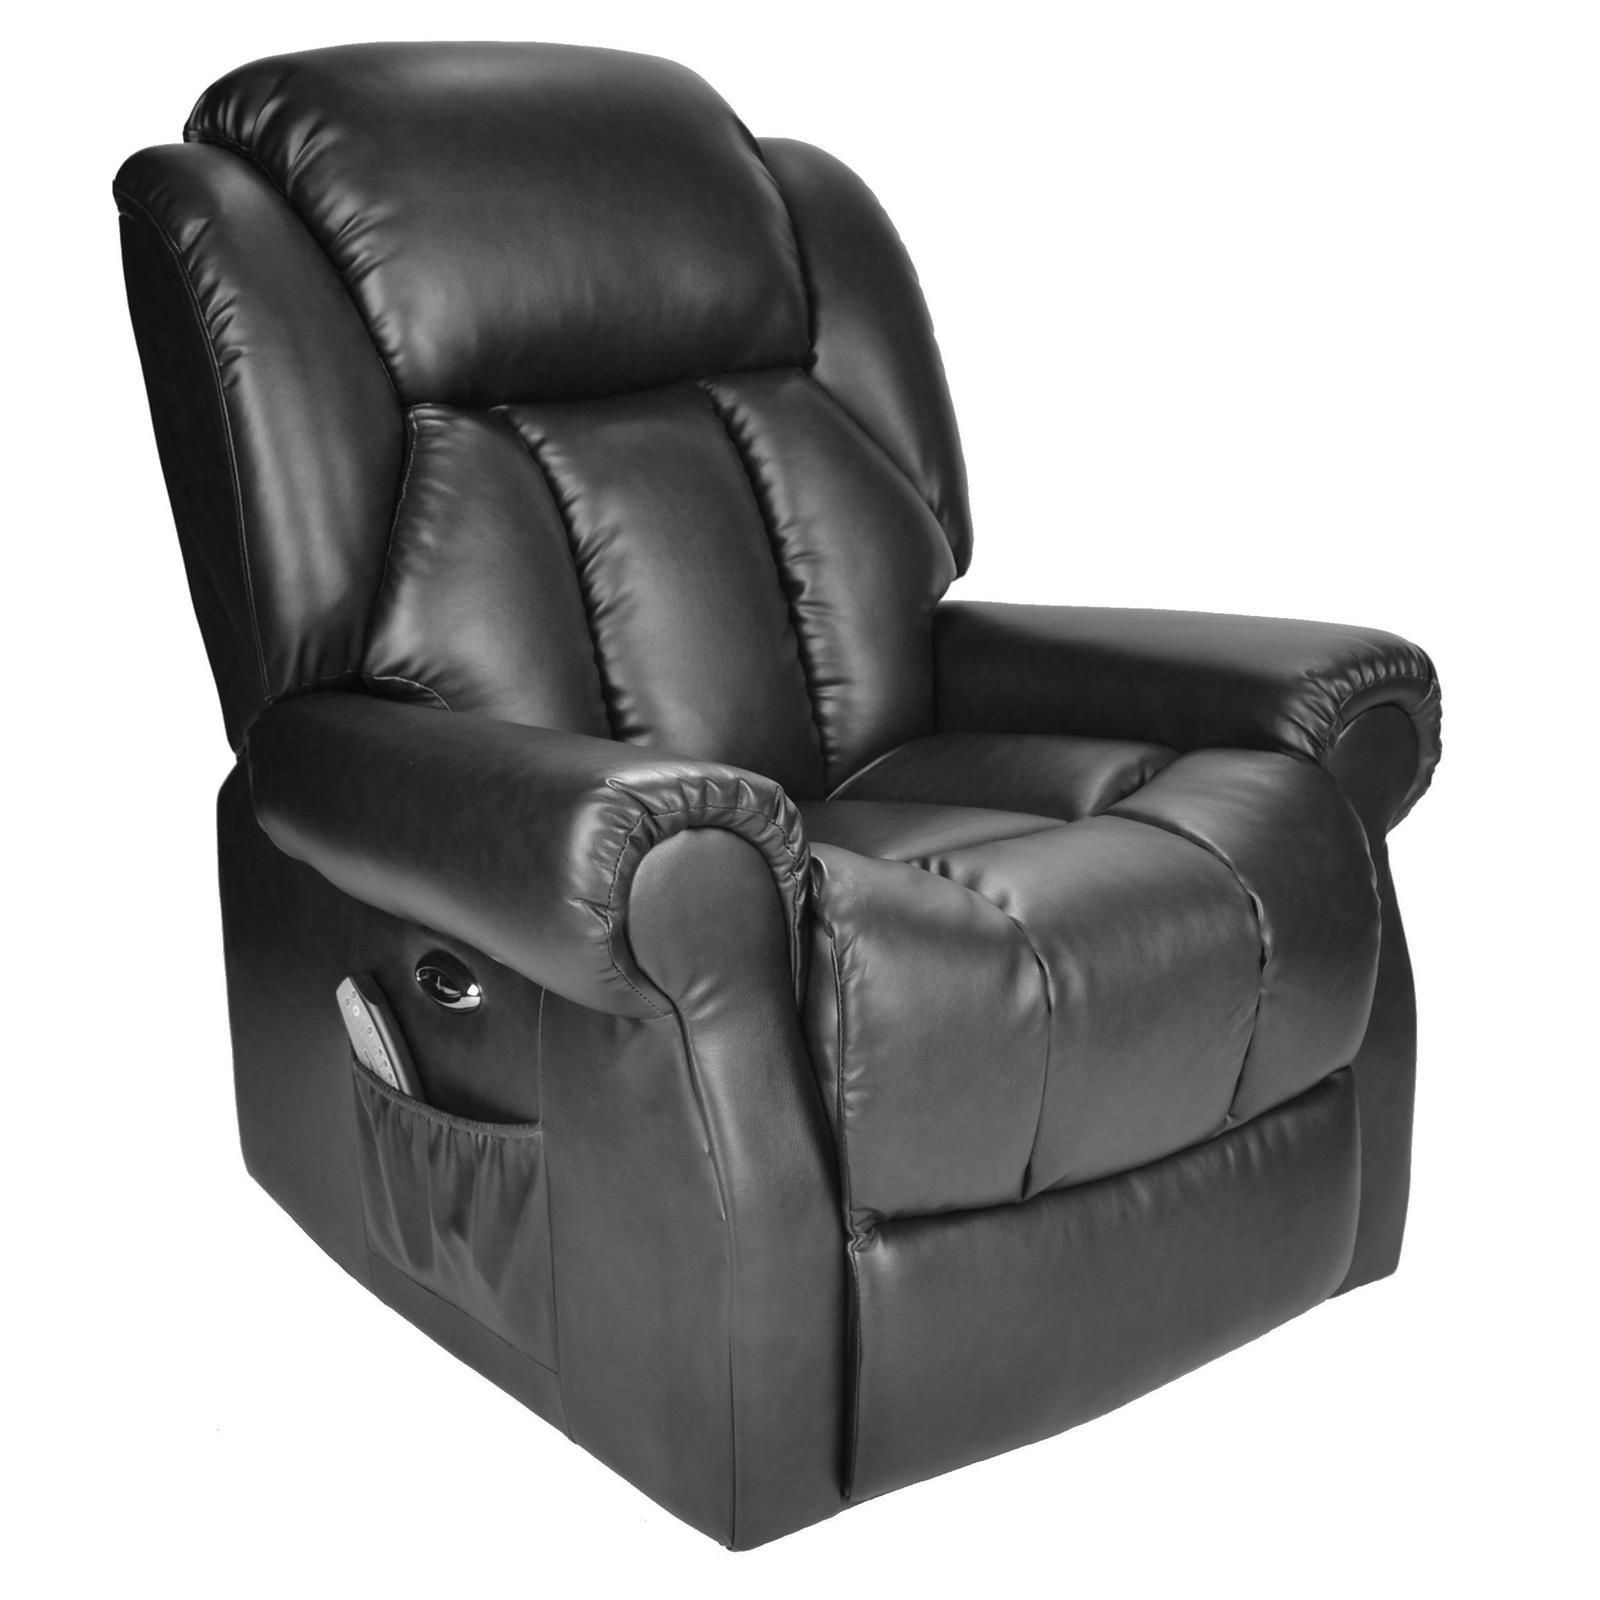 Hainworth Electric Recliner Black 1 3 Riser Chair